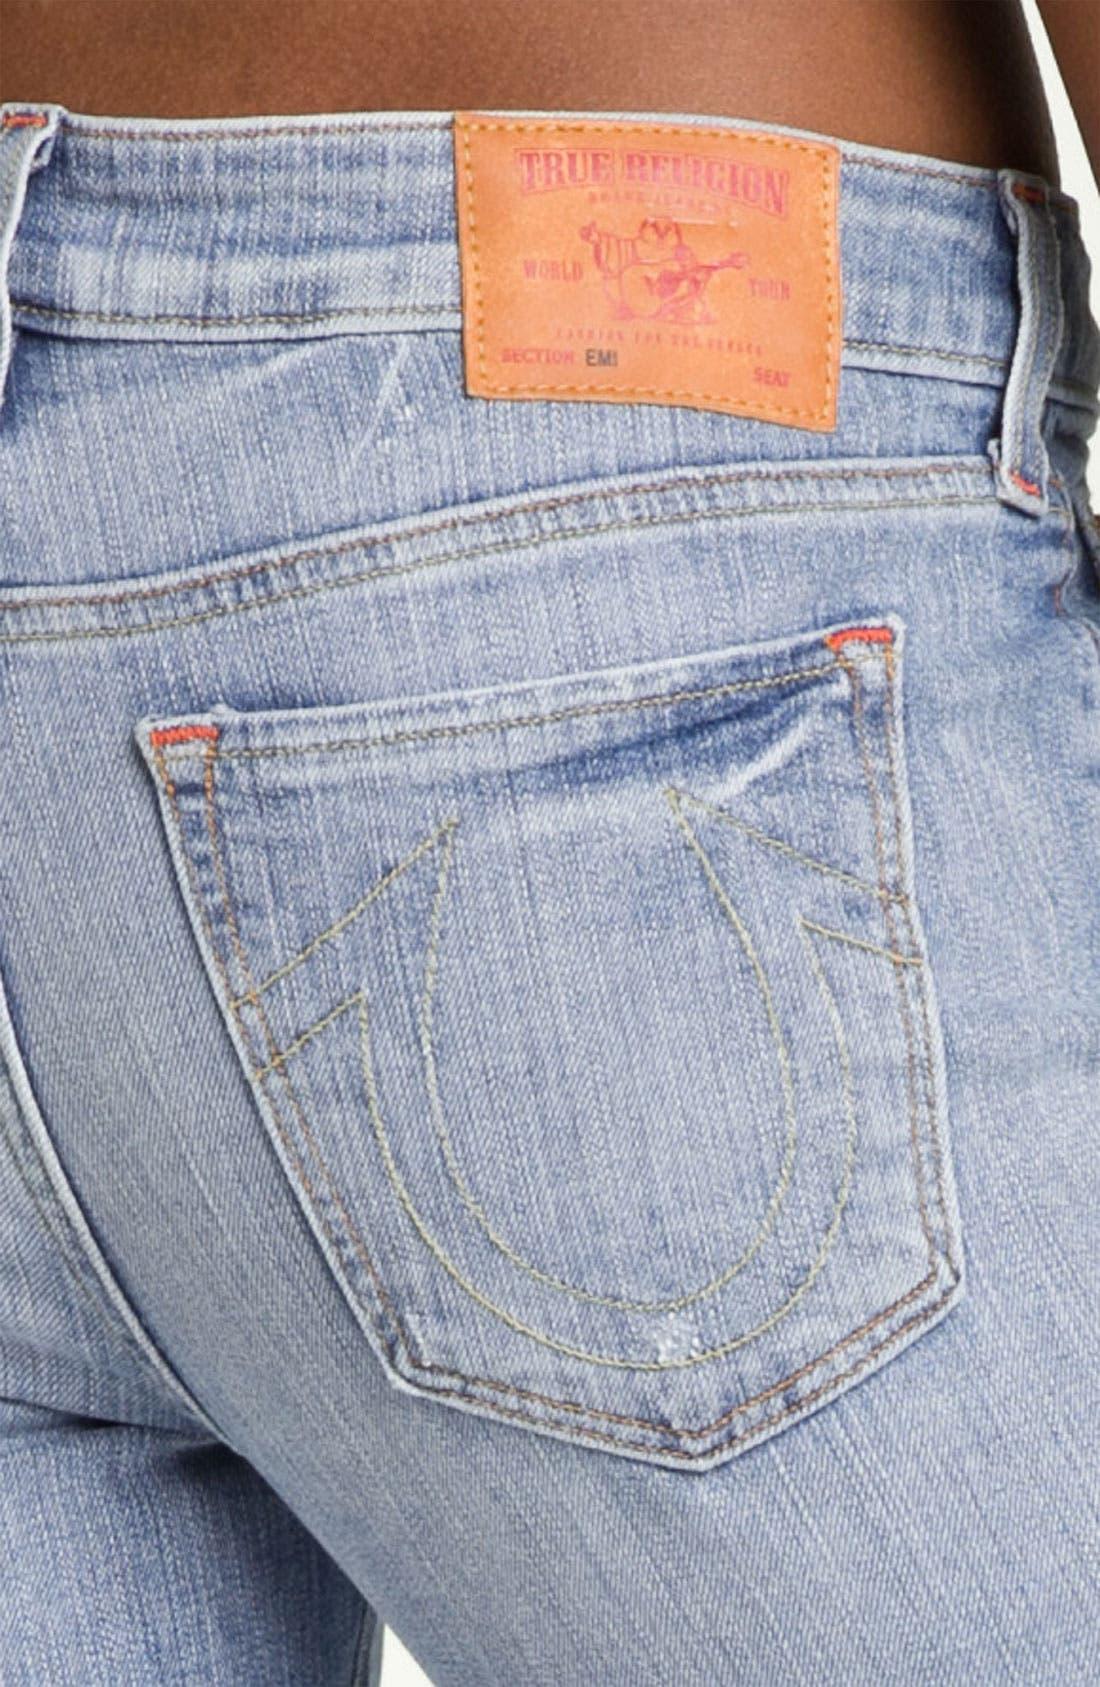 Alternate Image 3  - True Religion Brand Jeans 'Emi'' Distressed Flare Leg Jeans (Medium Drifter)